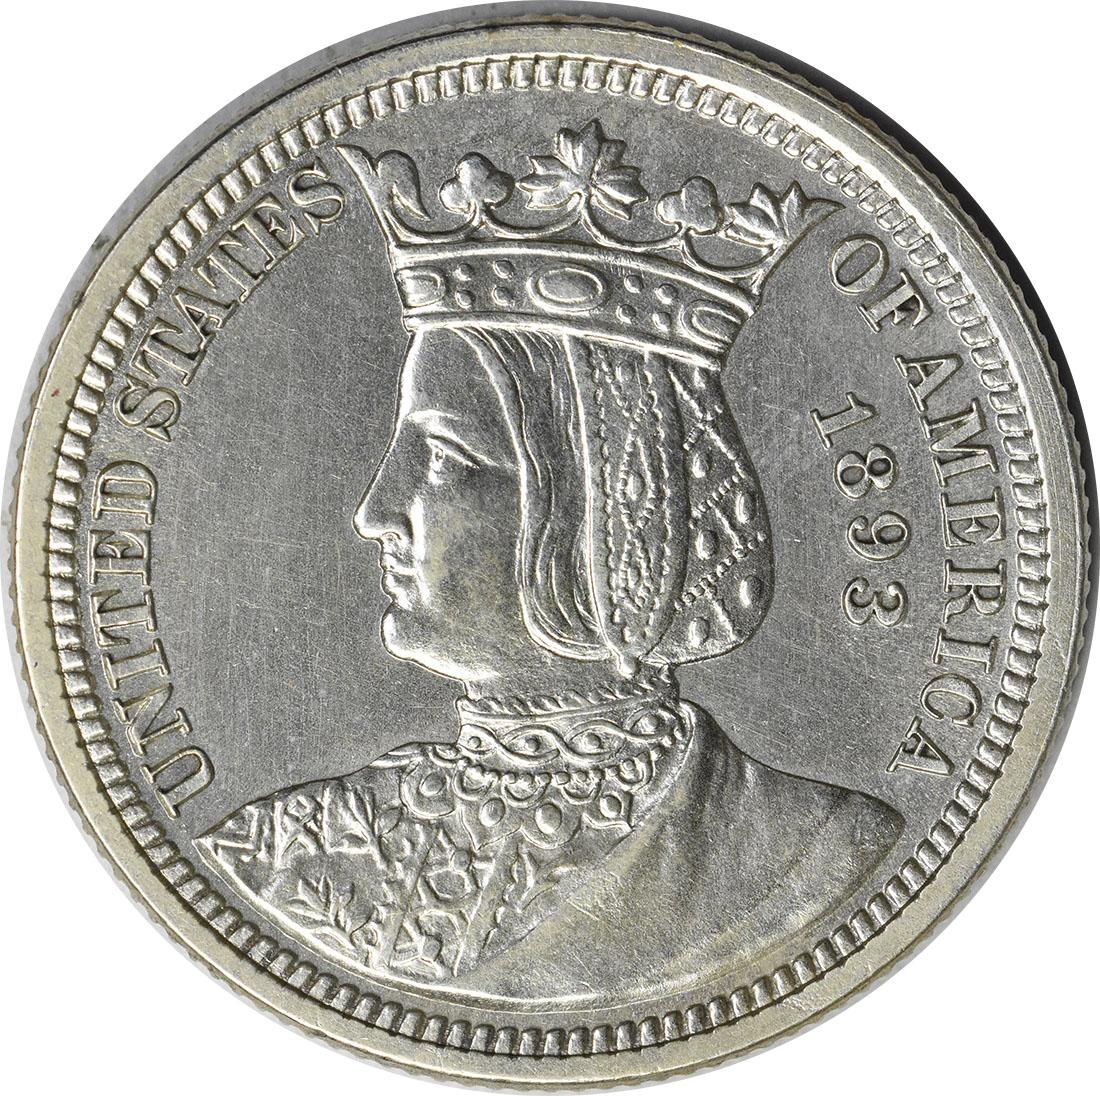 1893 Isabella Commemorative Silver Quarter AU58 Uncertified